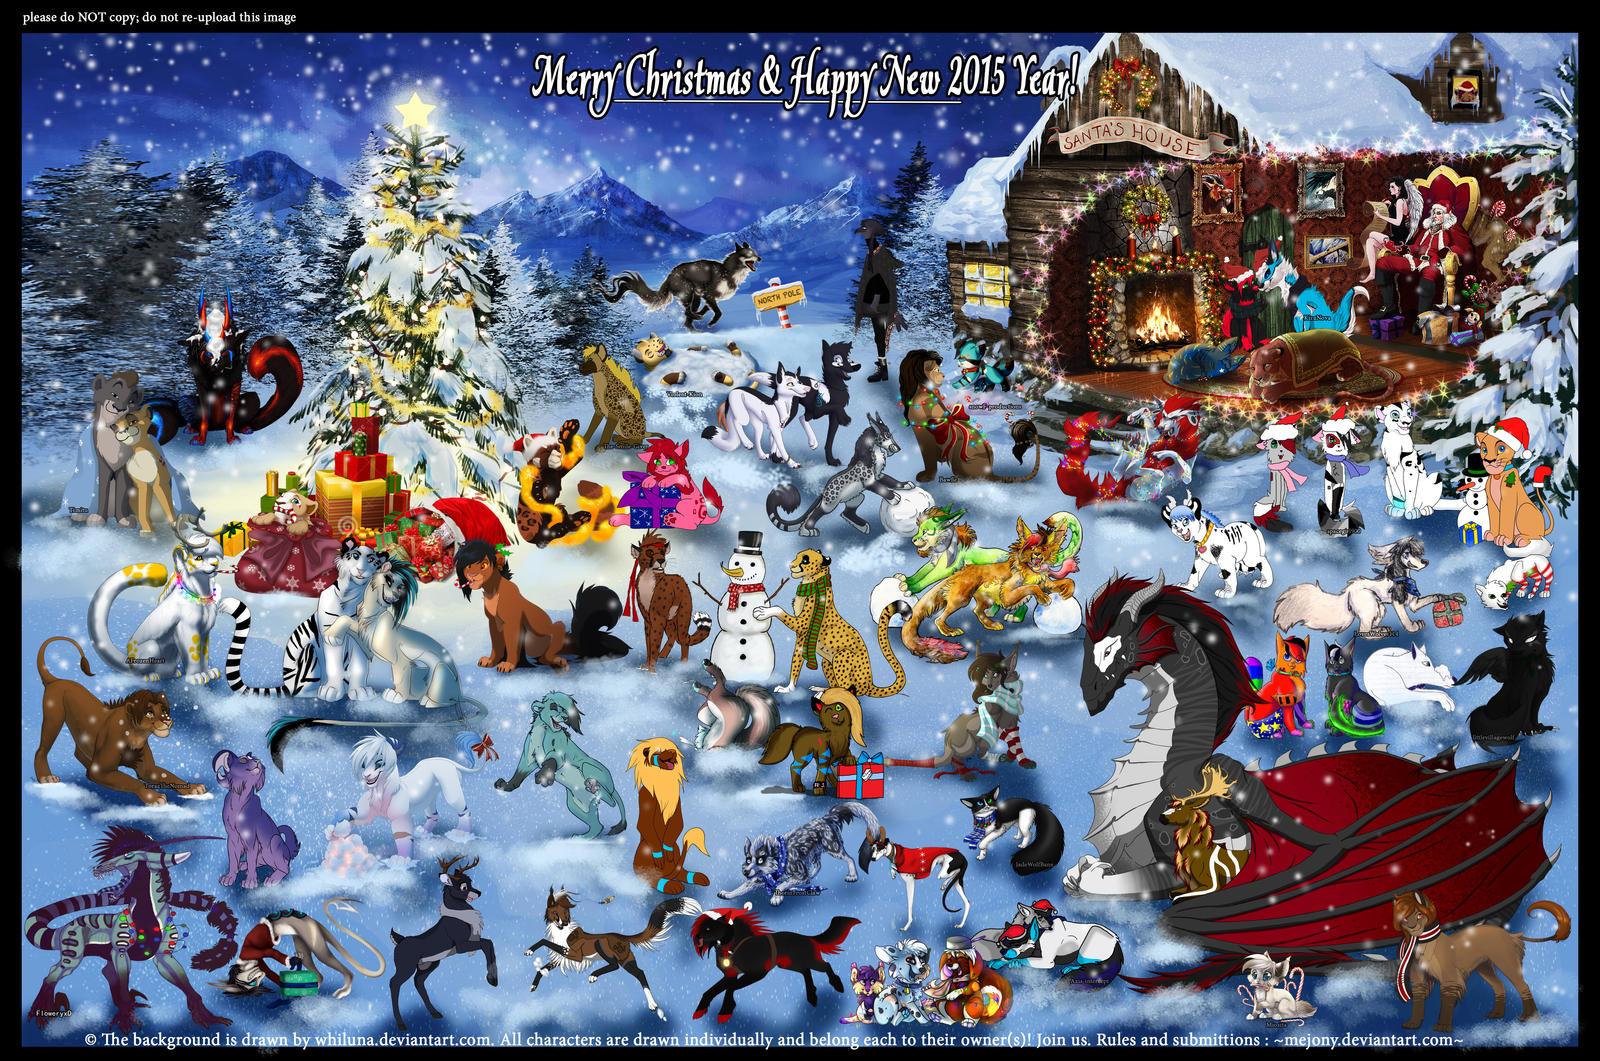 ChristmasCollab2014 by JonyRichardson